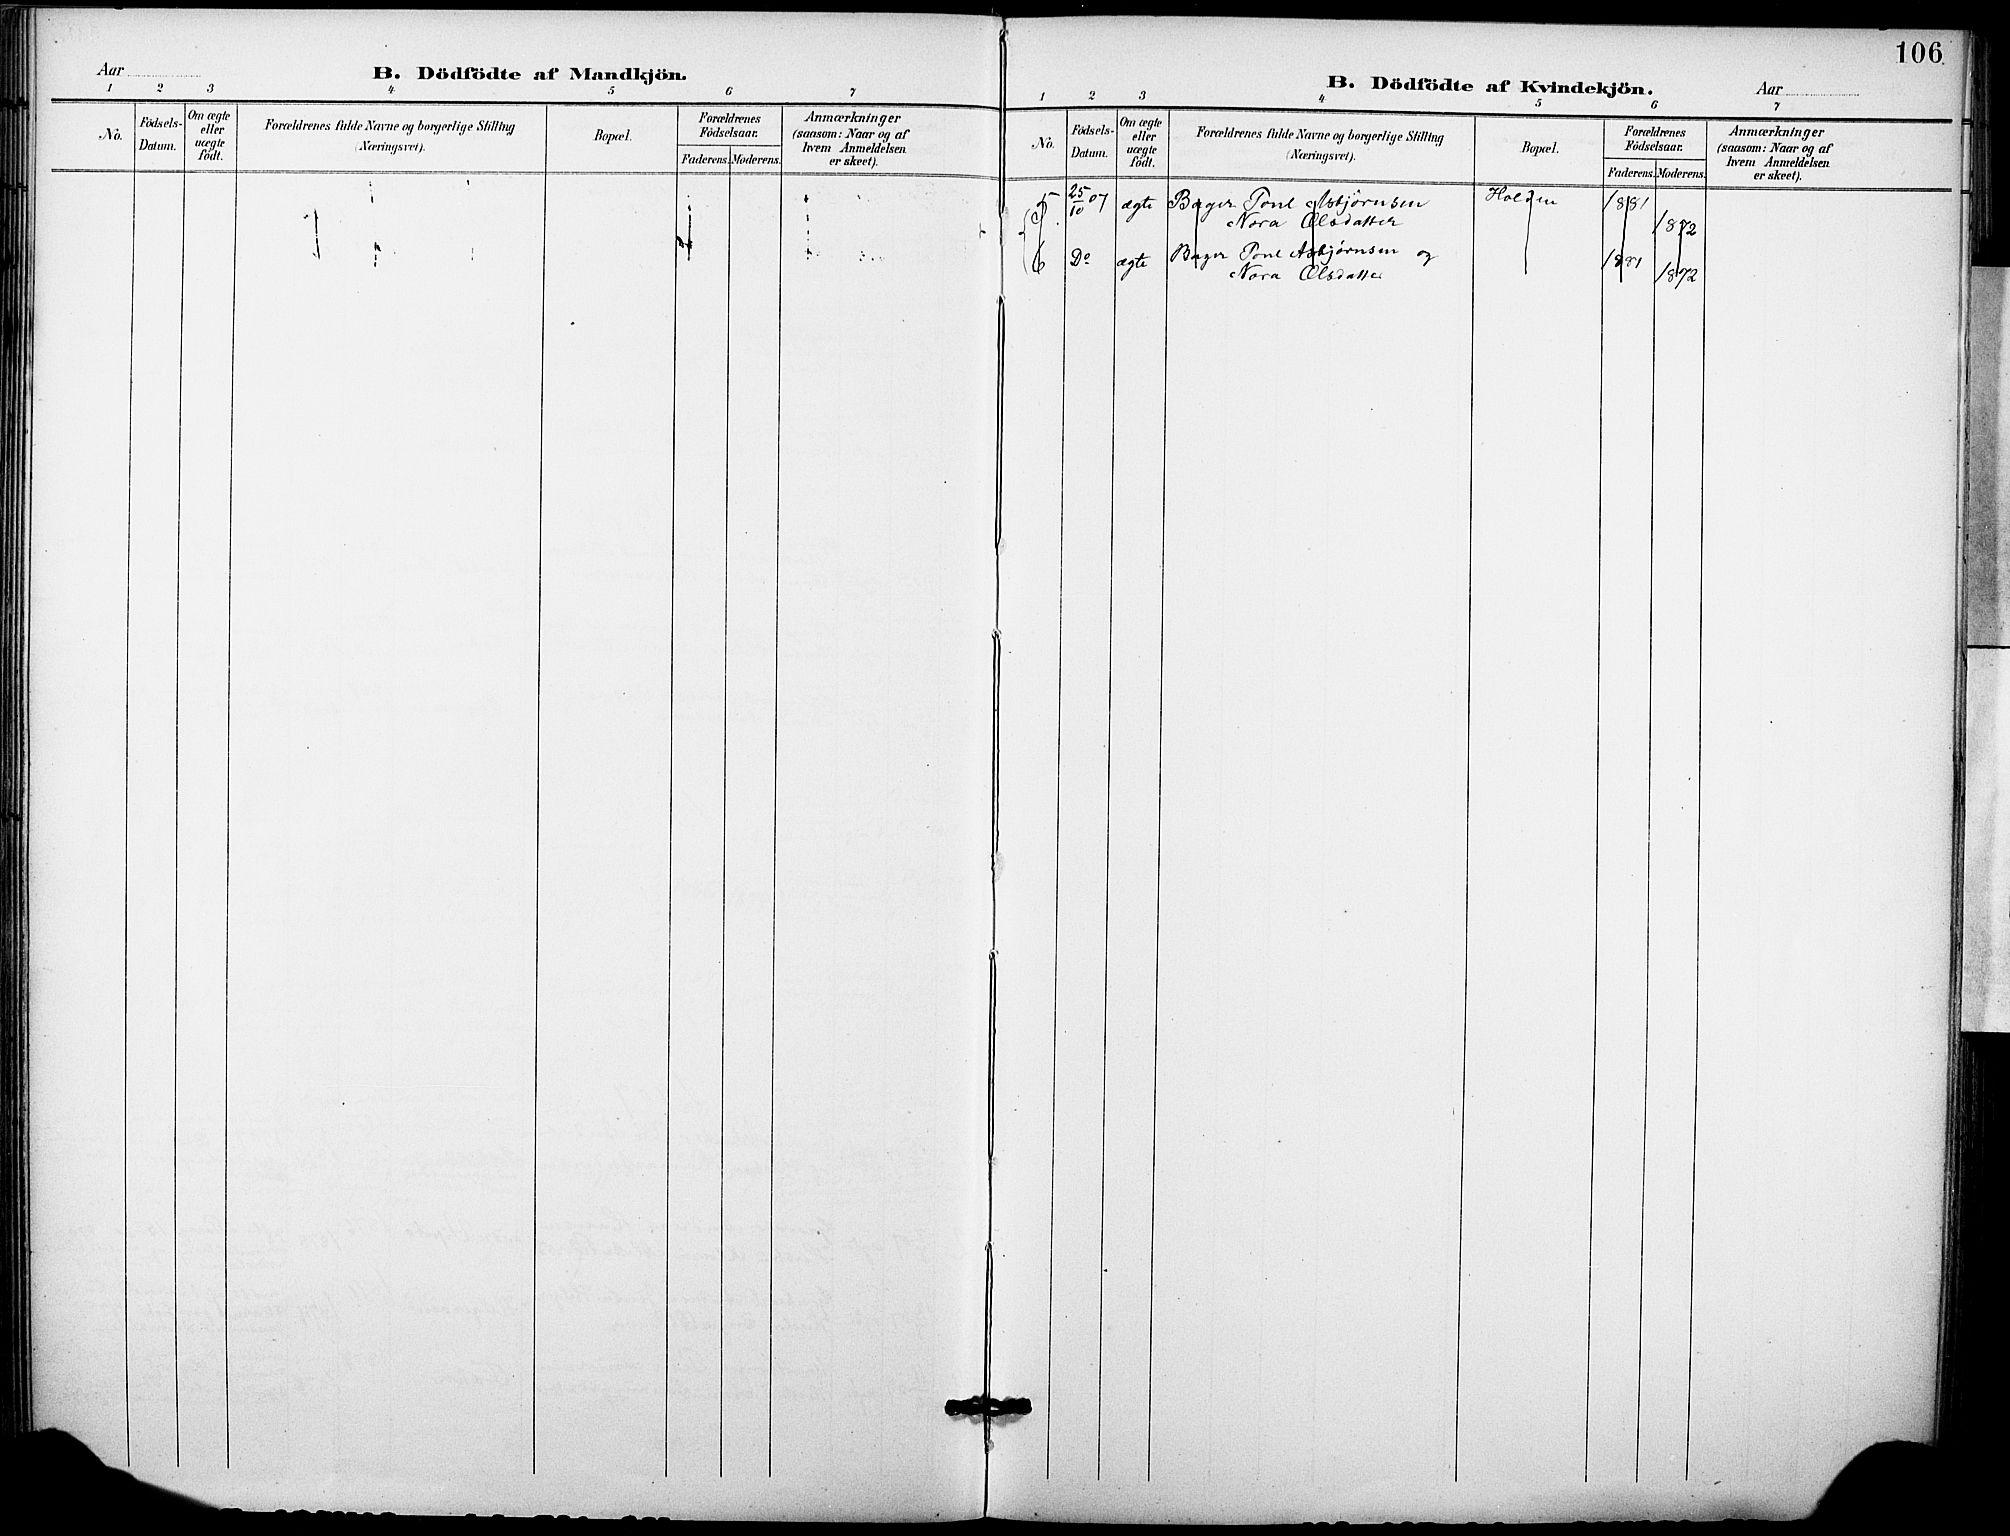 SAKO, Holla kirkebøker, F/Fa/L0010: Ministerialbok nr. 10, 1897-1907, s. 106